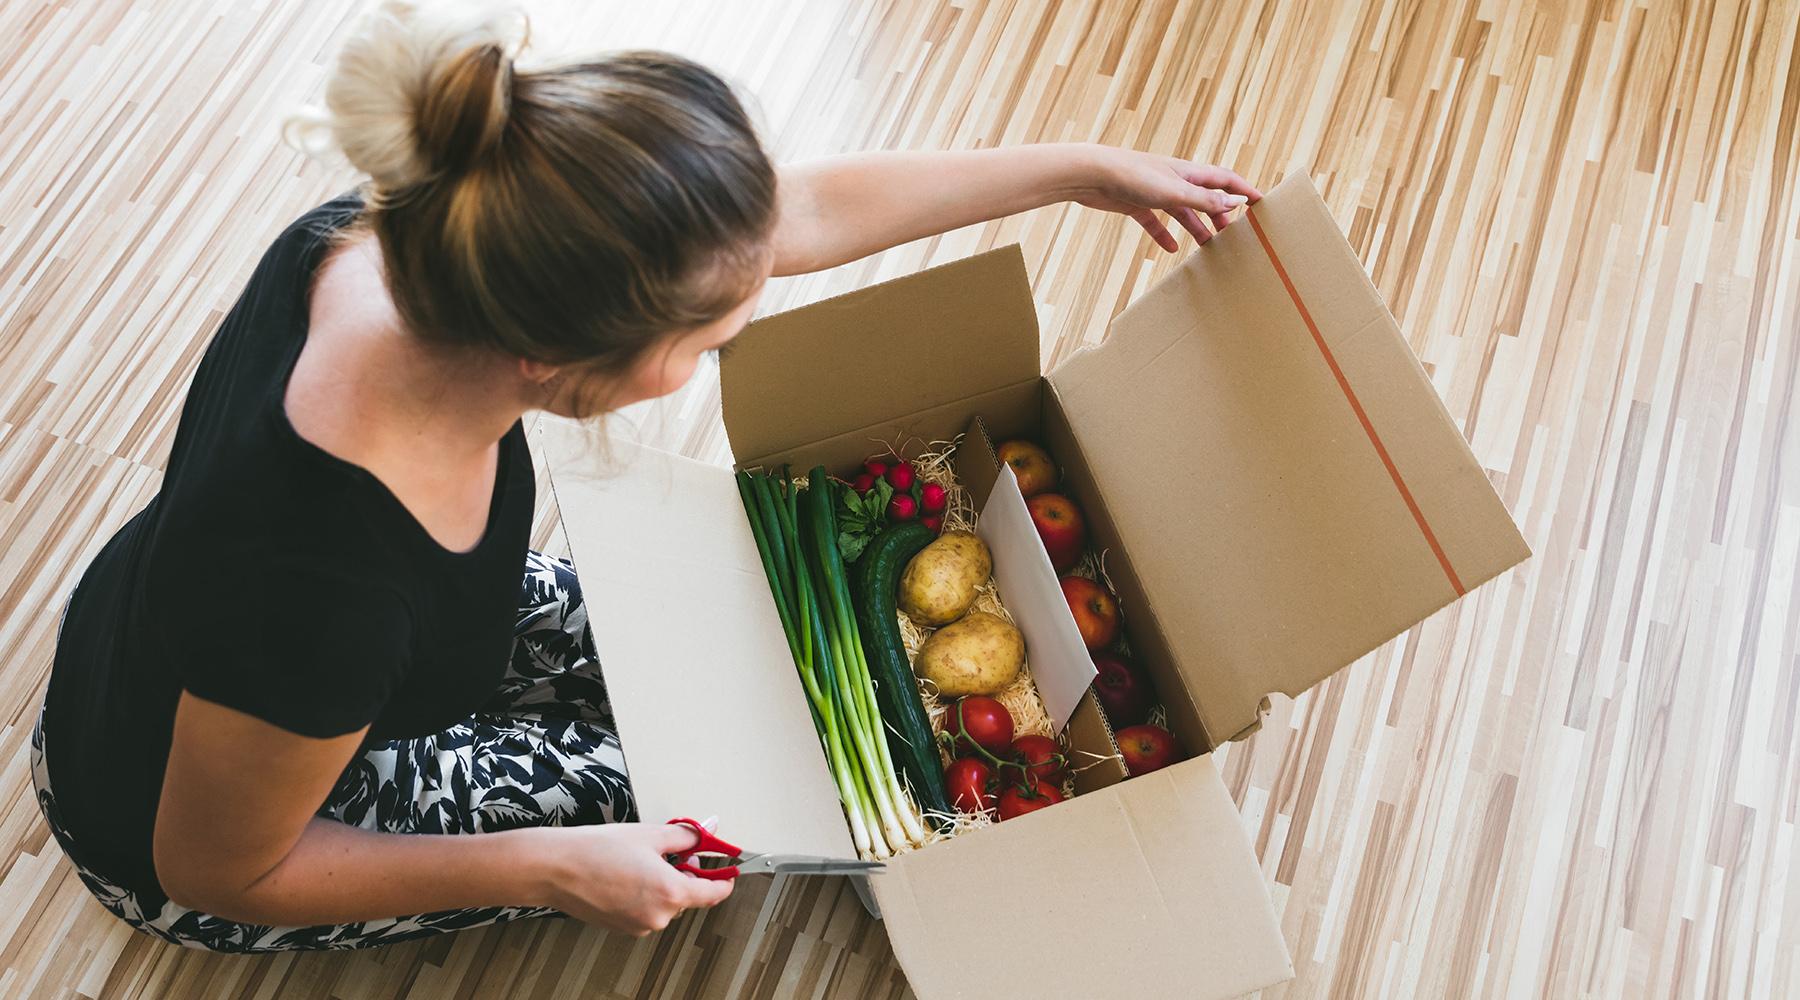 Frau öffnet Kiste mit Lebensmitteln, Lieferservice per postsendung